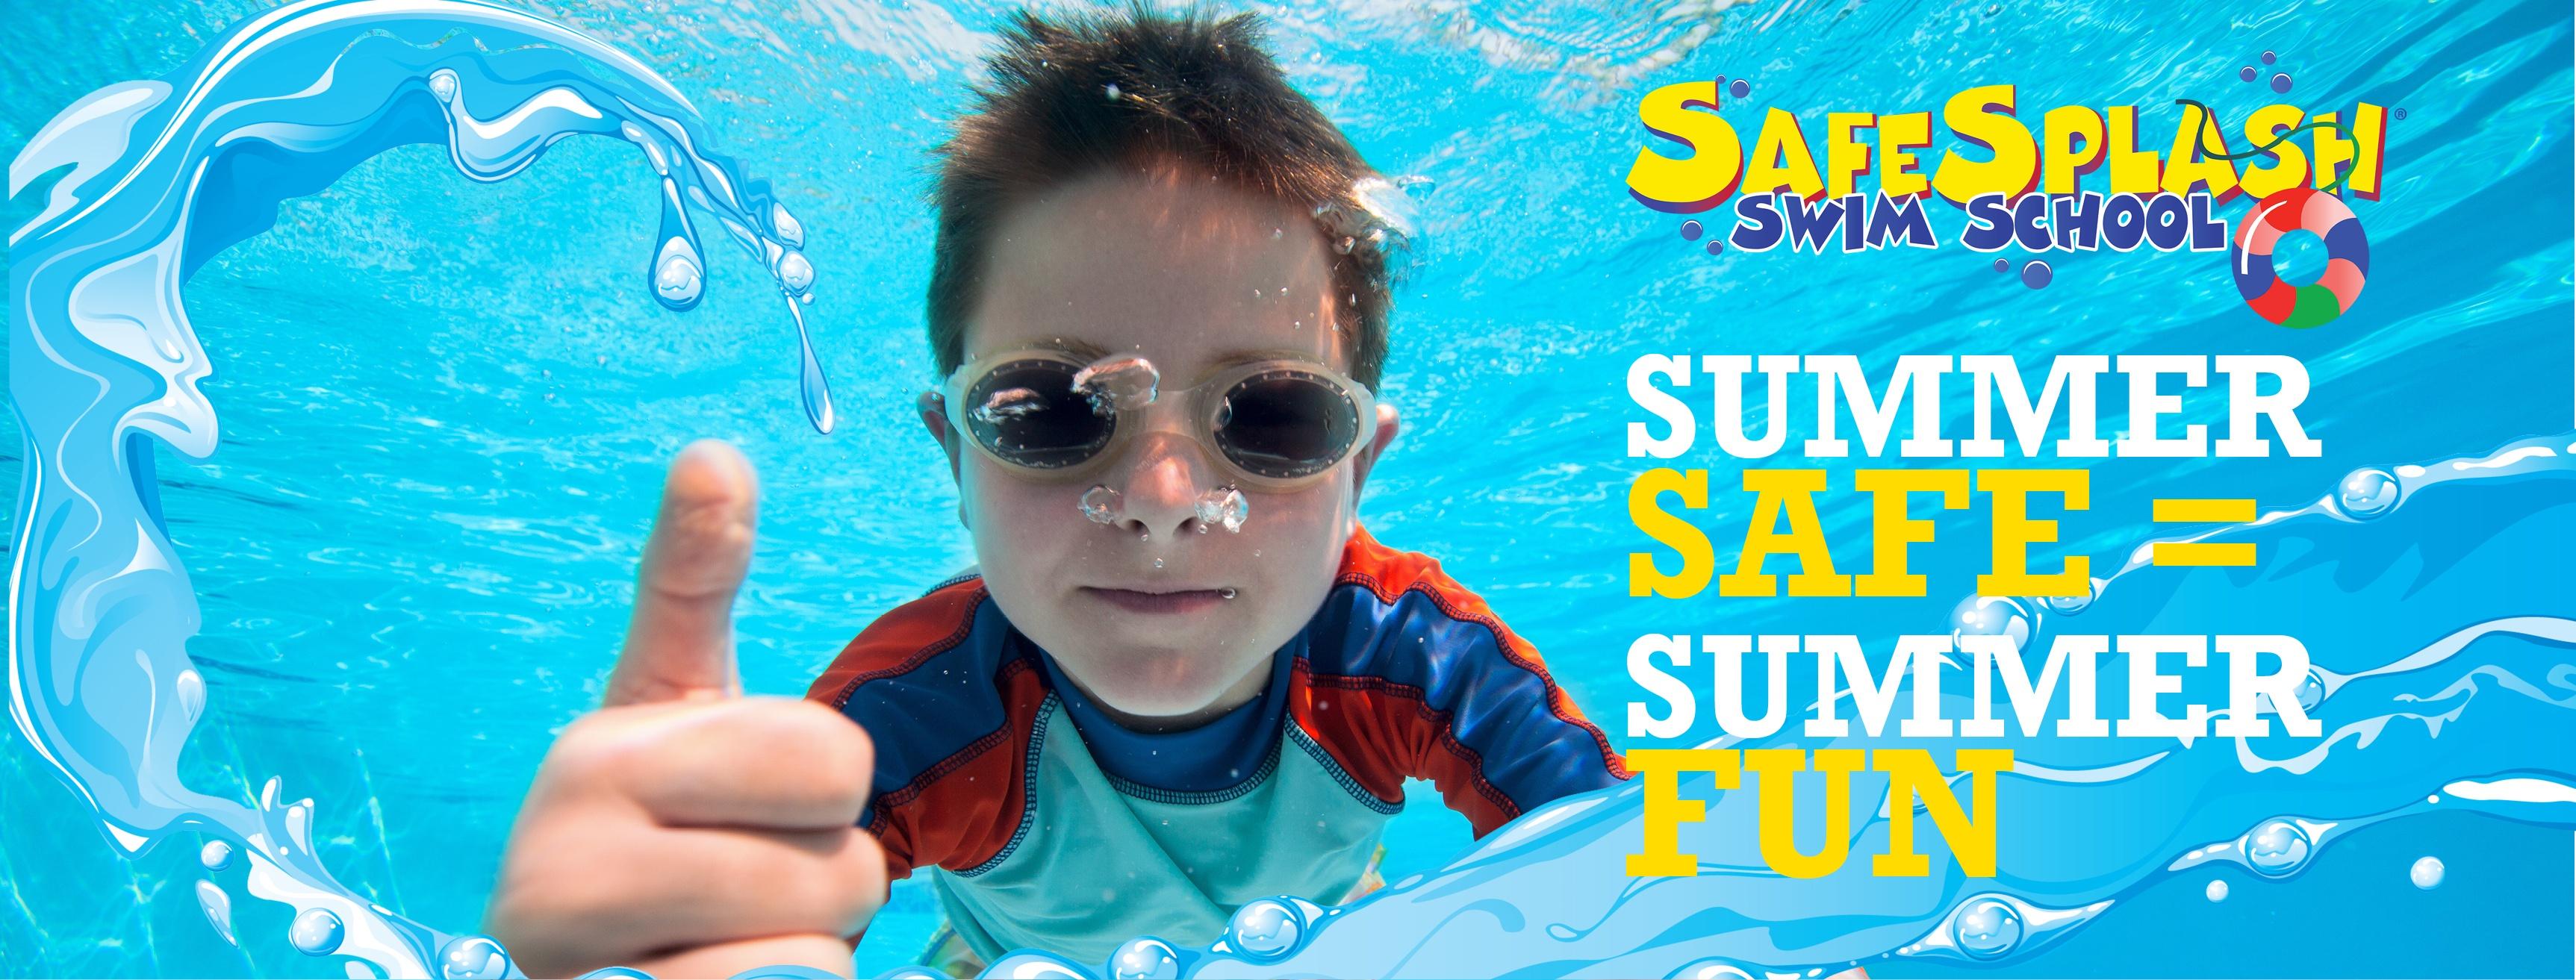 SummerSafe_SummerFun FB Banner.jpg